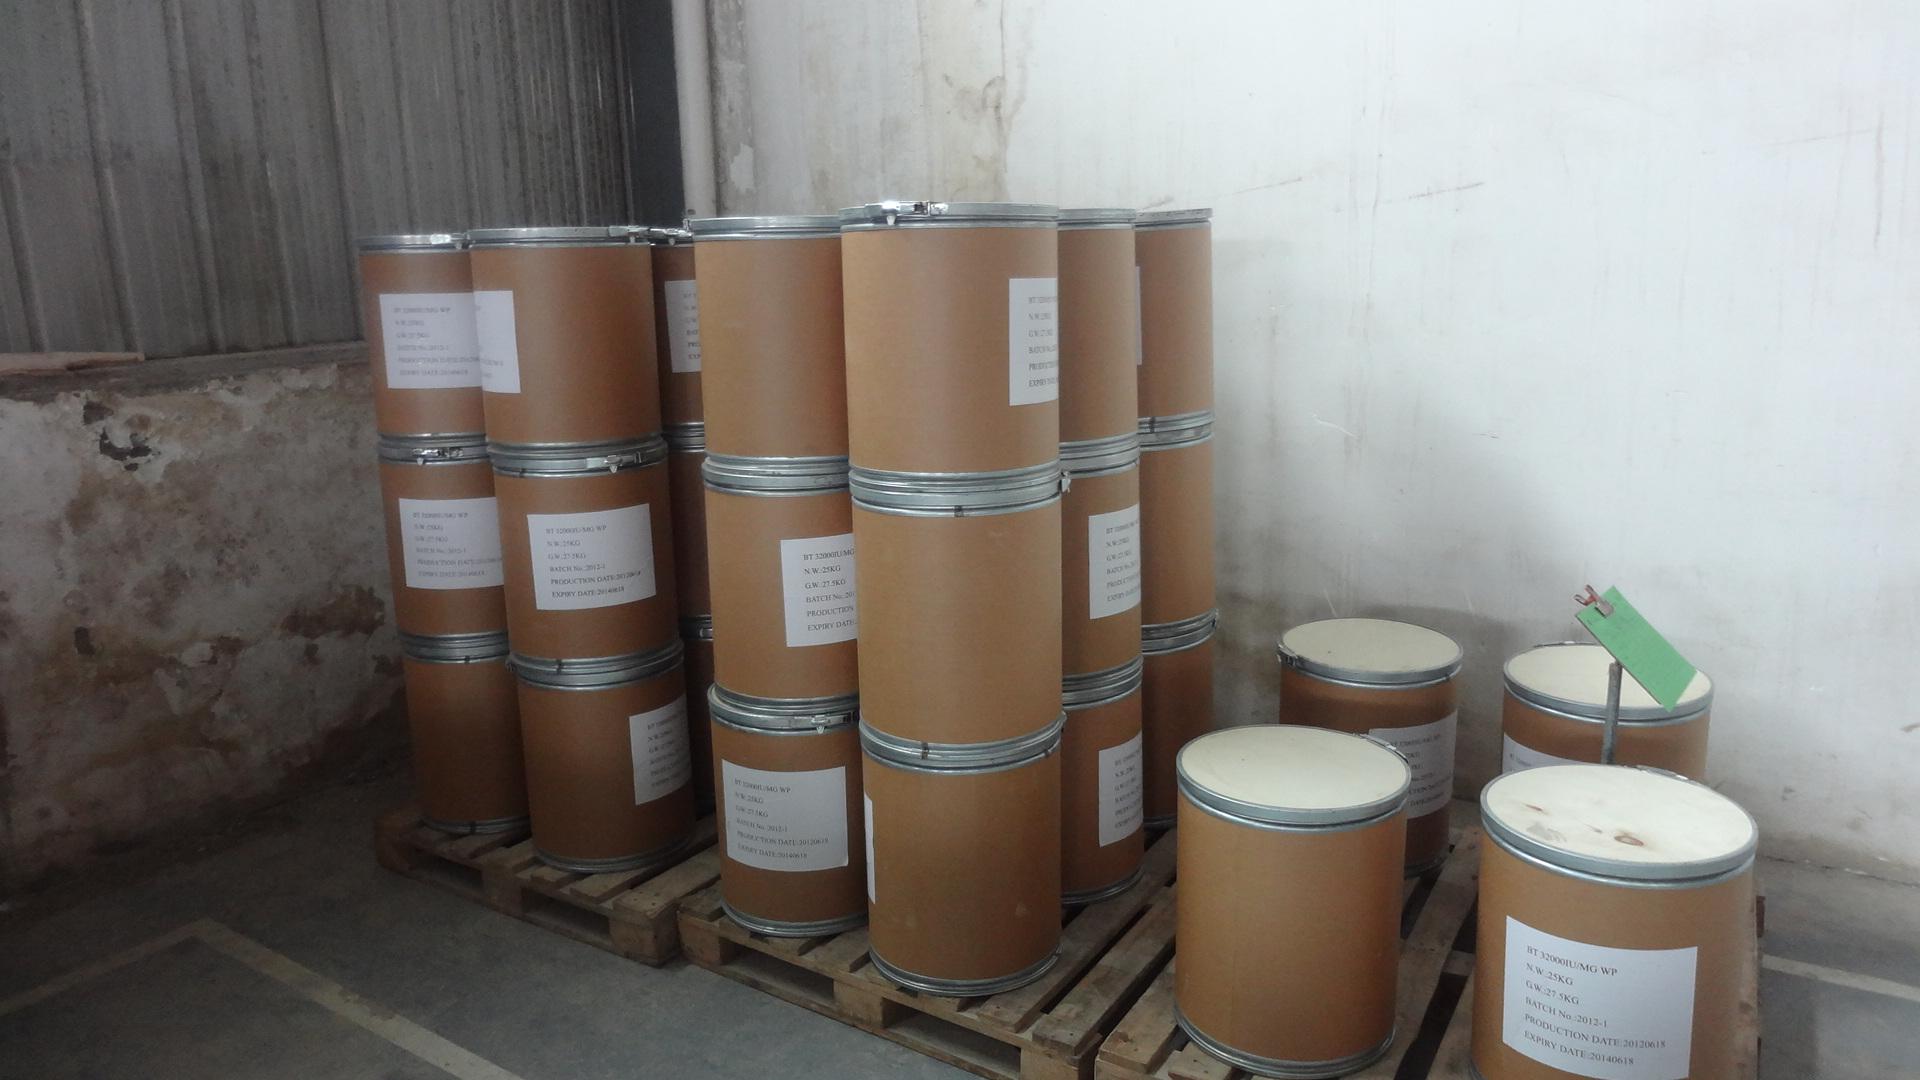 Insecticide 32000IU/MG WP bacillus thuringiensis